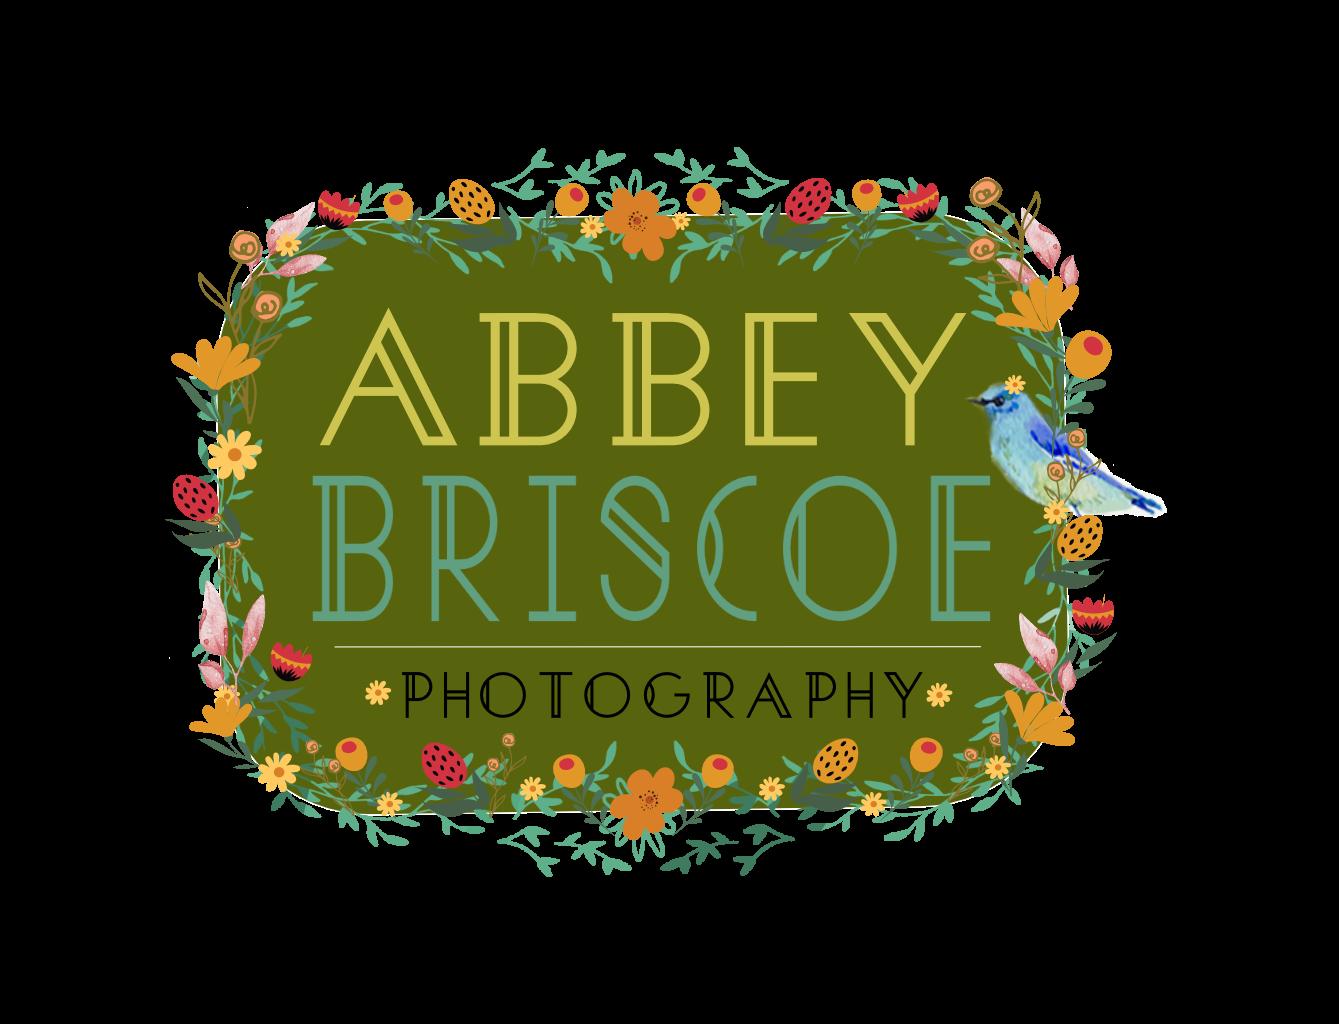 Abbey Briscoe